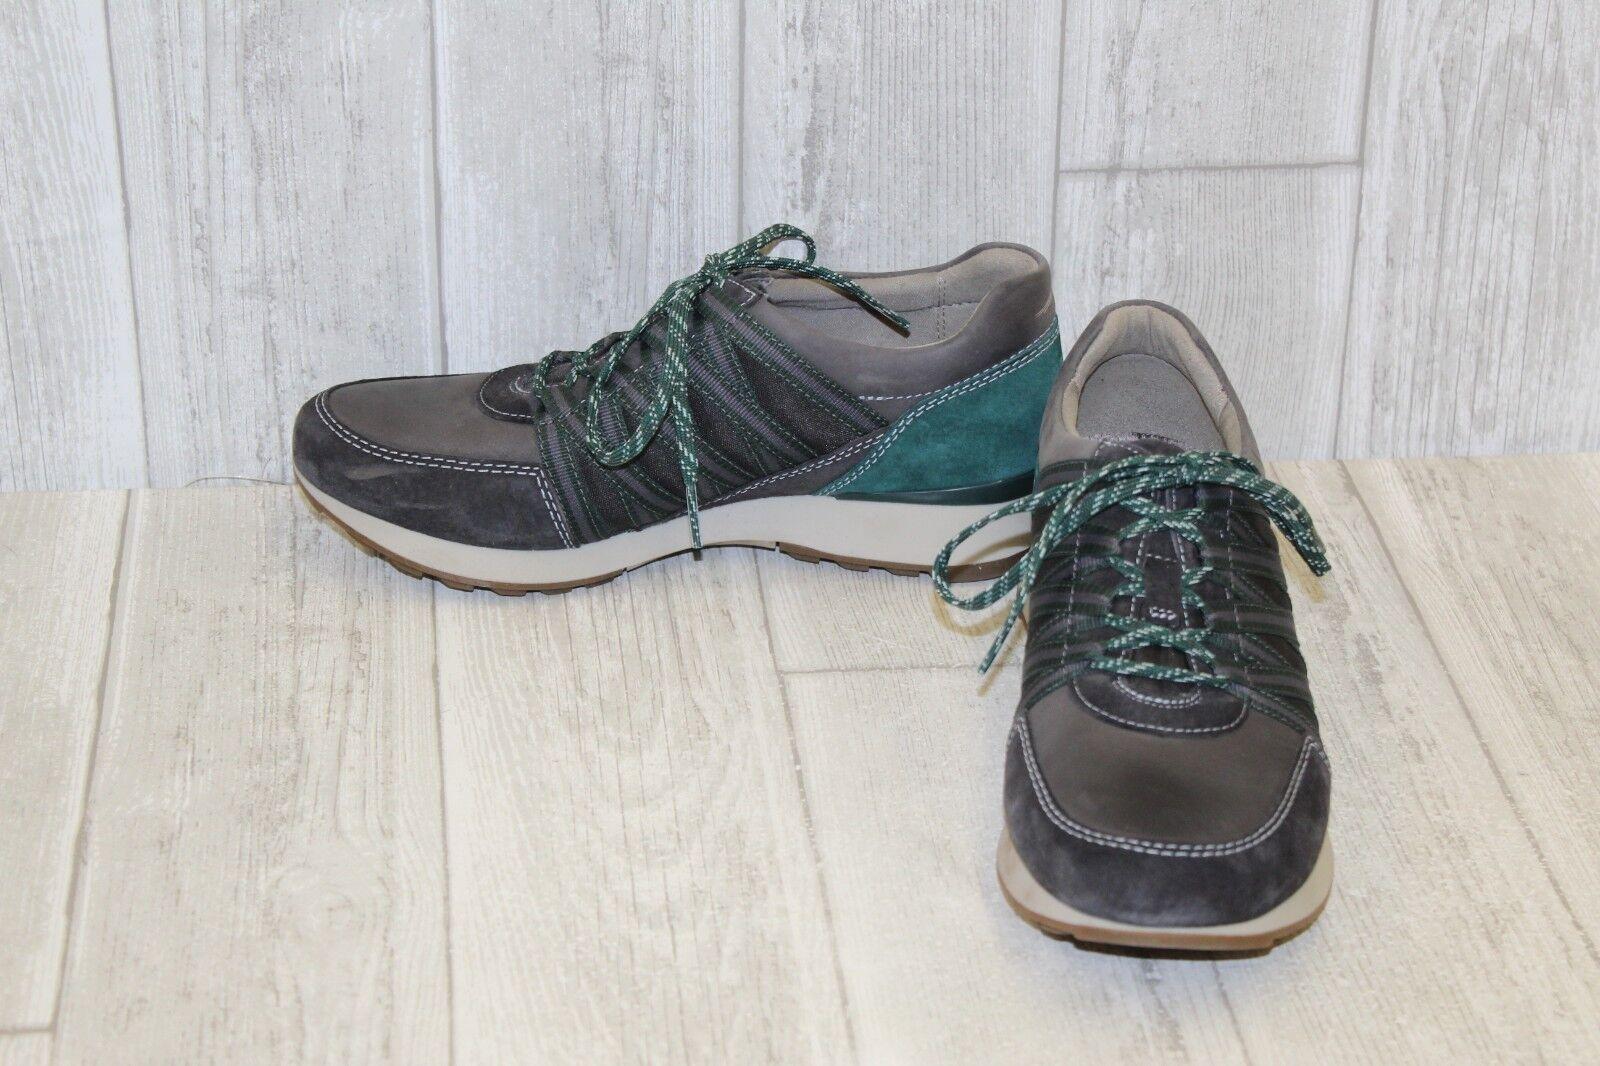 Dansko Gabi Athletic Athletic Athletic Sneaker - Women's Size 6.5-7 - Charcoal Green db22ab